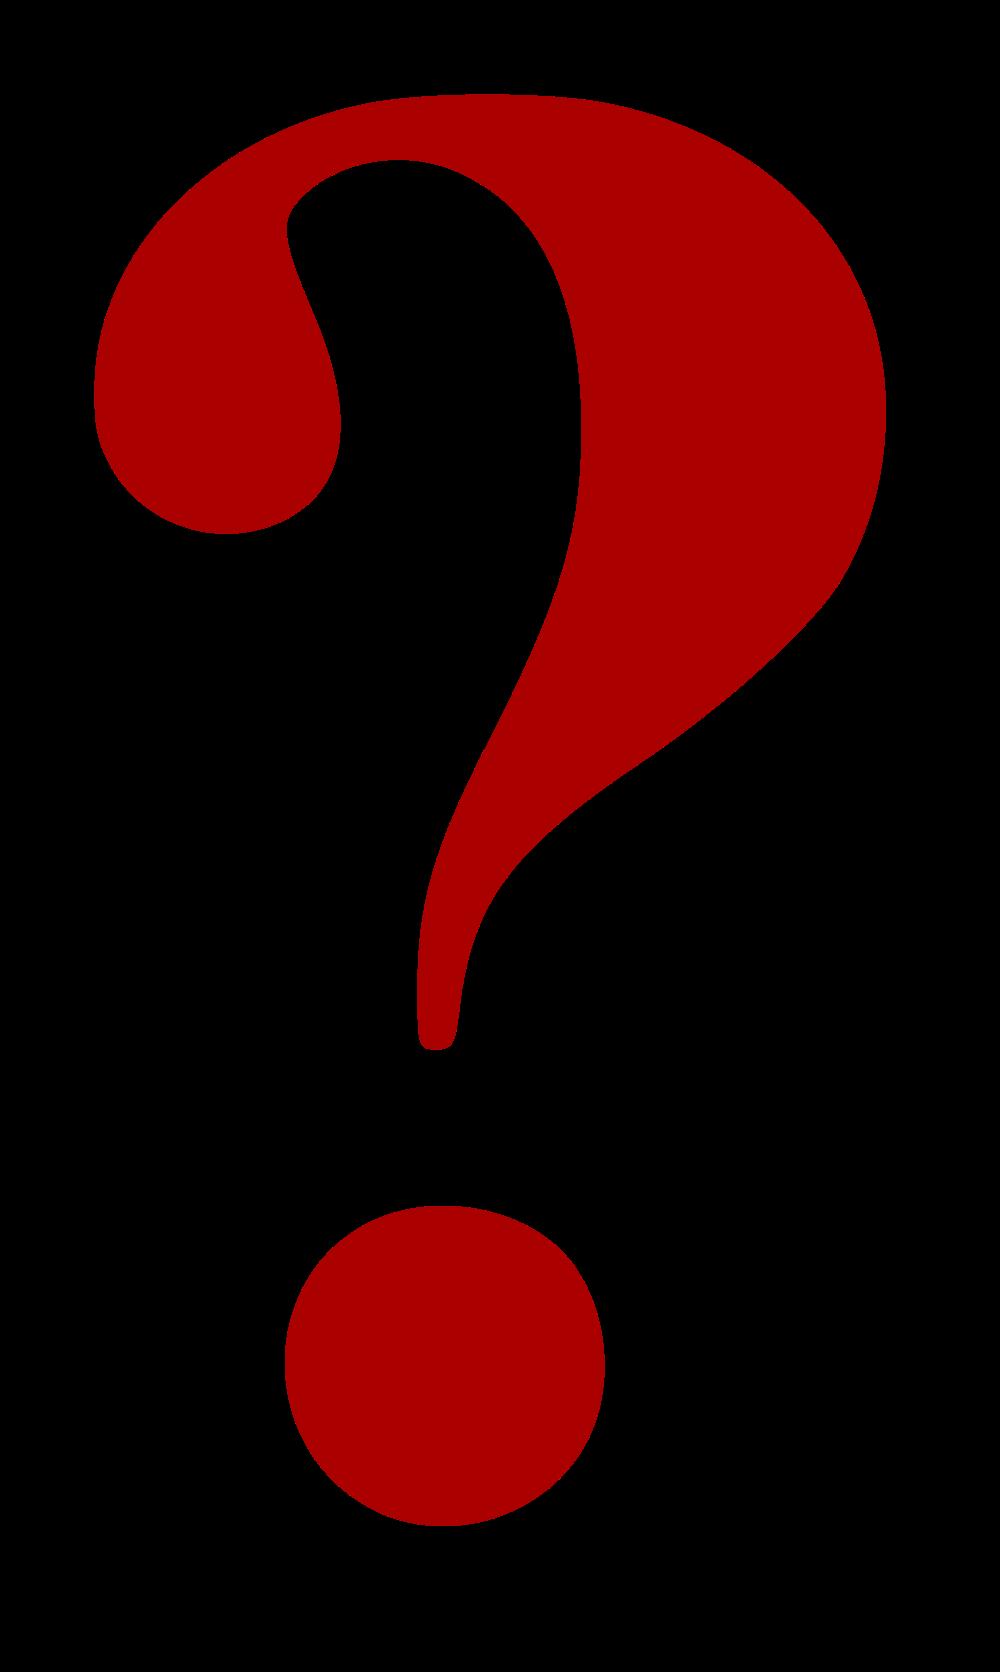 clip art download Question clipart essential question